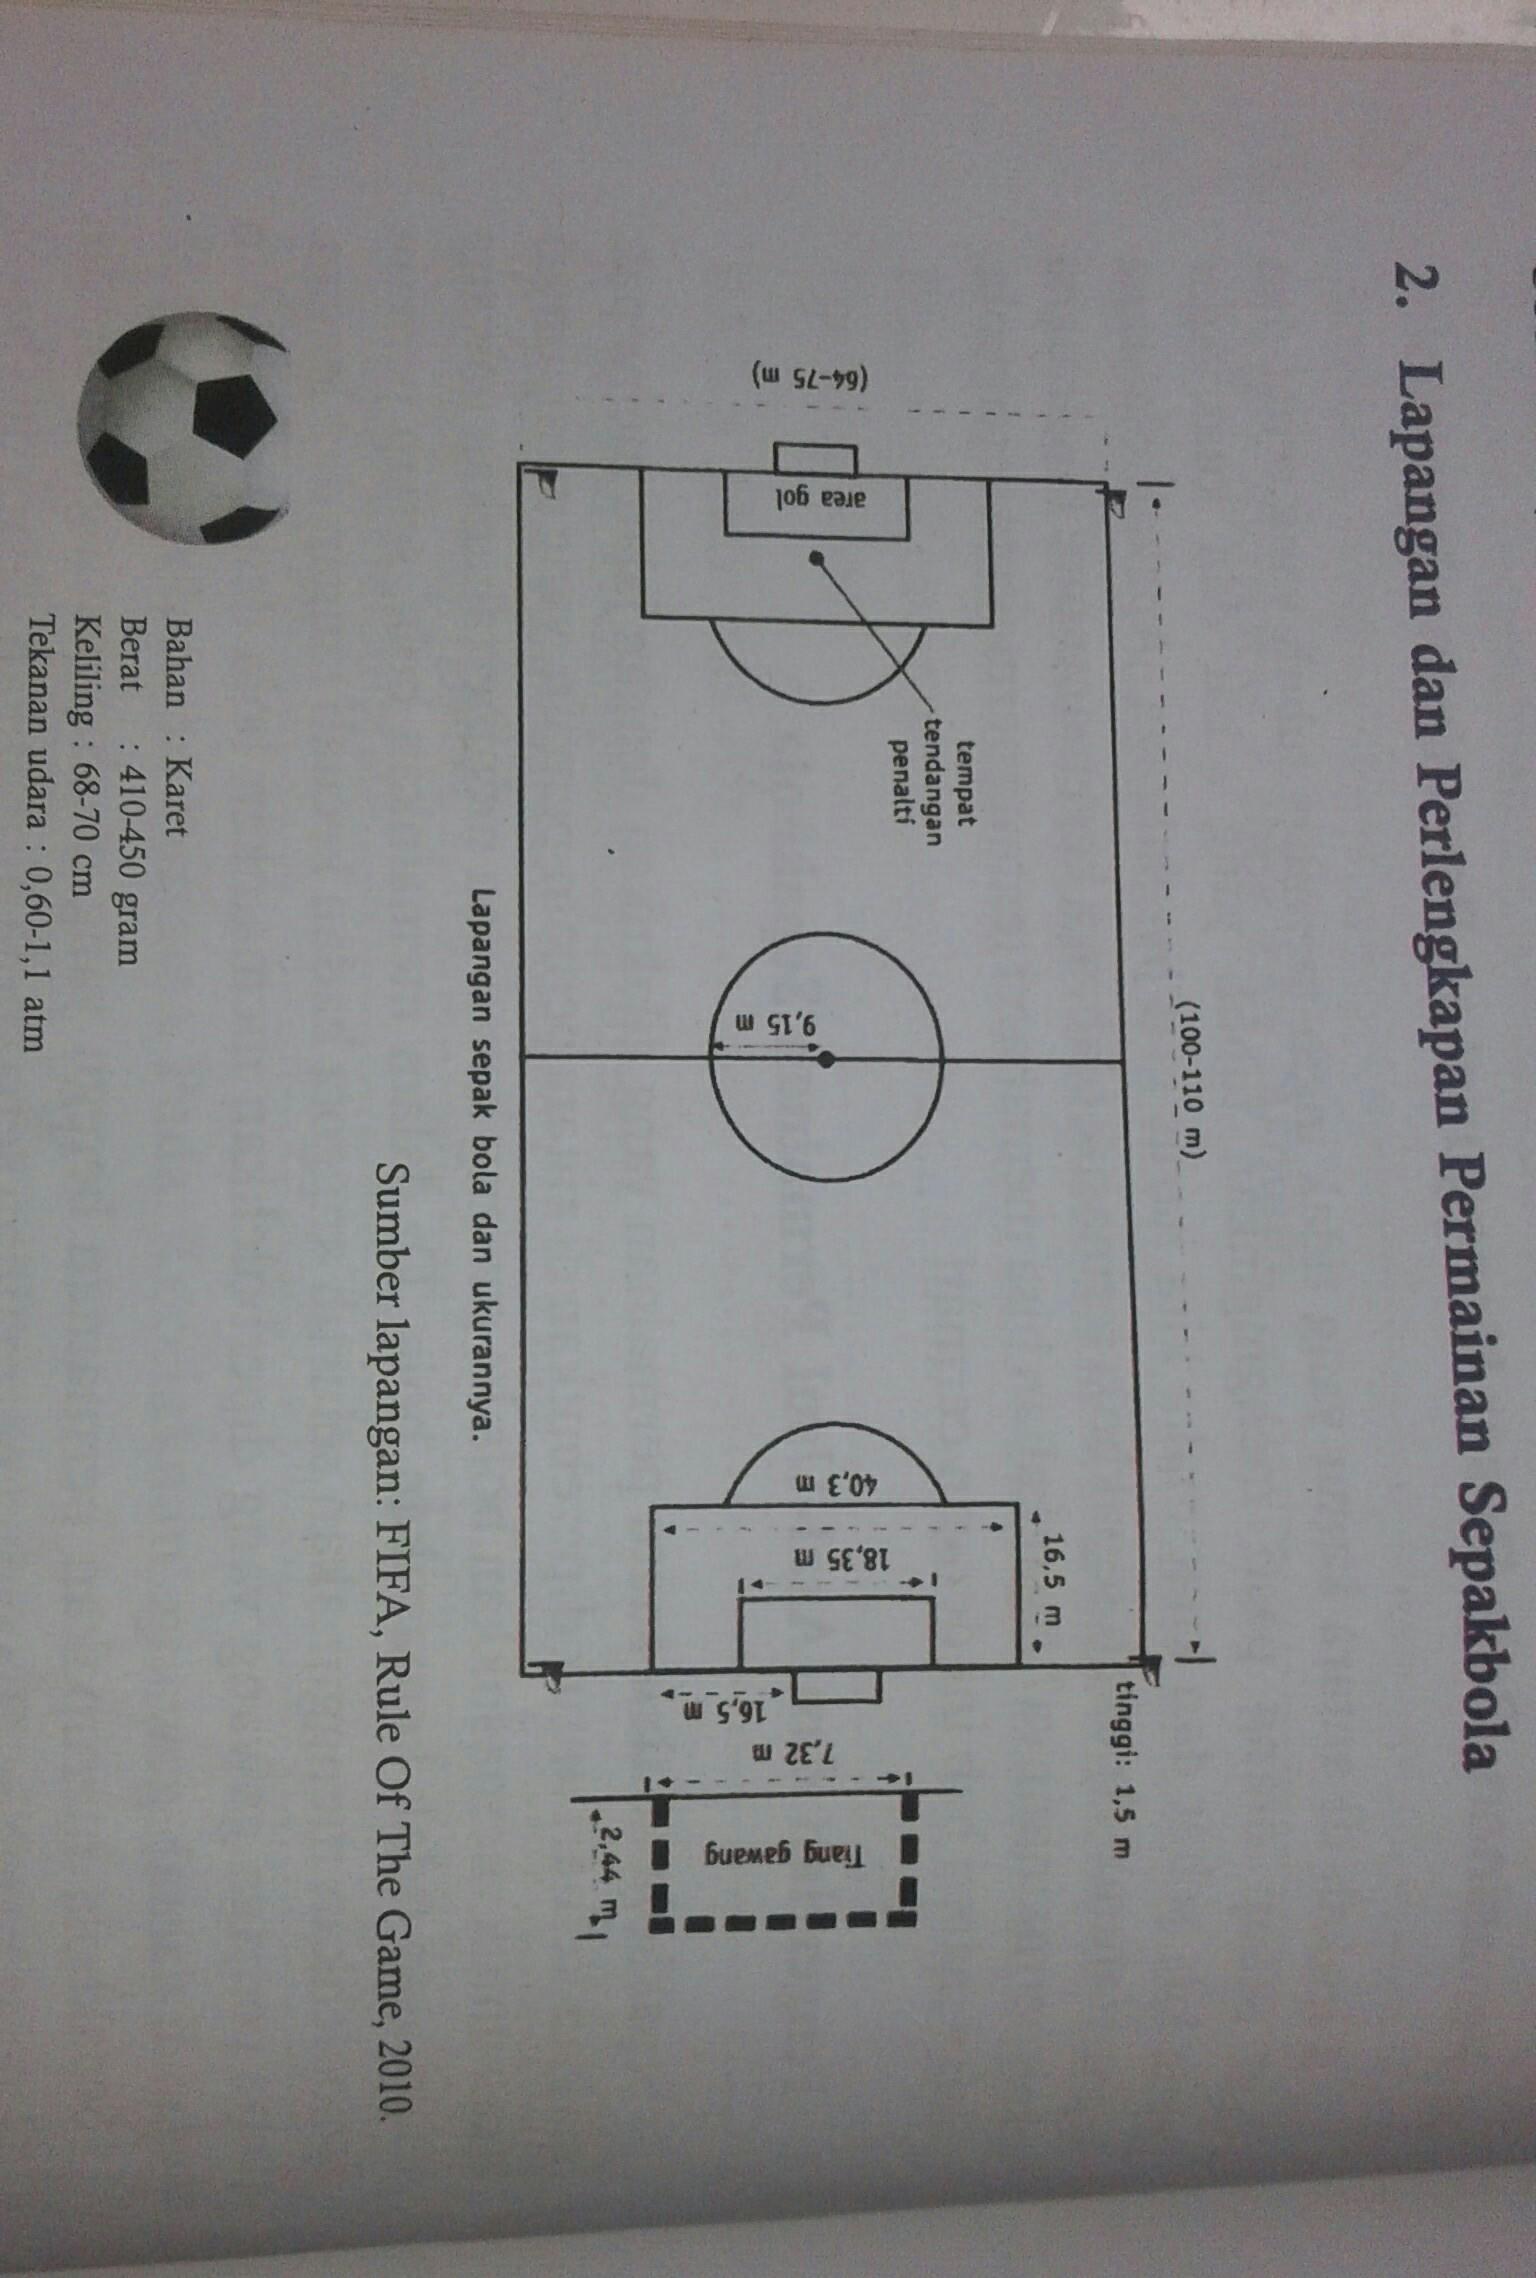 Panjang Dan Lebar Lapangan Bola : panjang, lebar, lapangan, Berapa, Panjang, Lebar, Lapangan, Basket, Sepak, Brainly.co.id